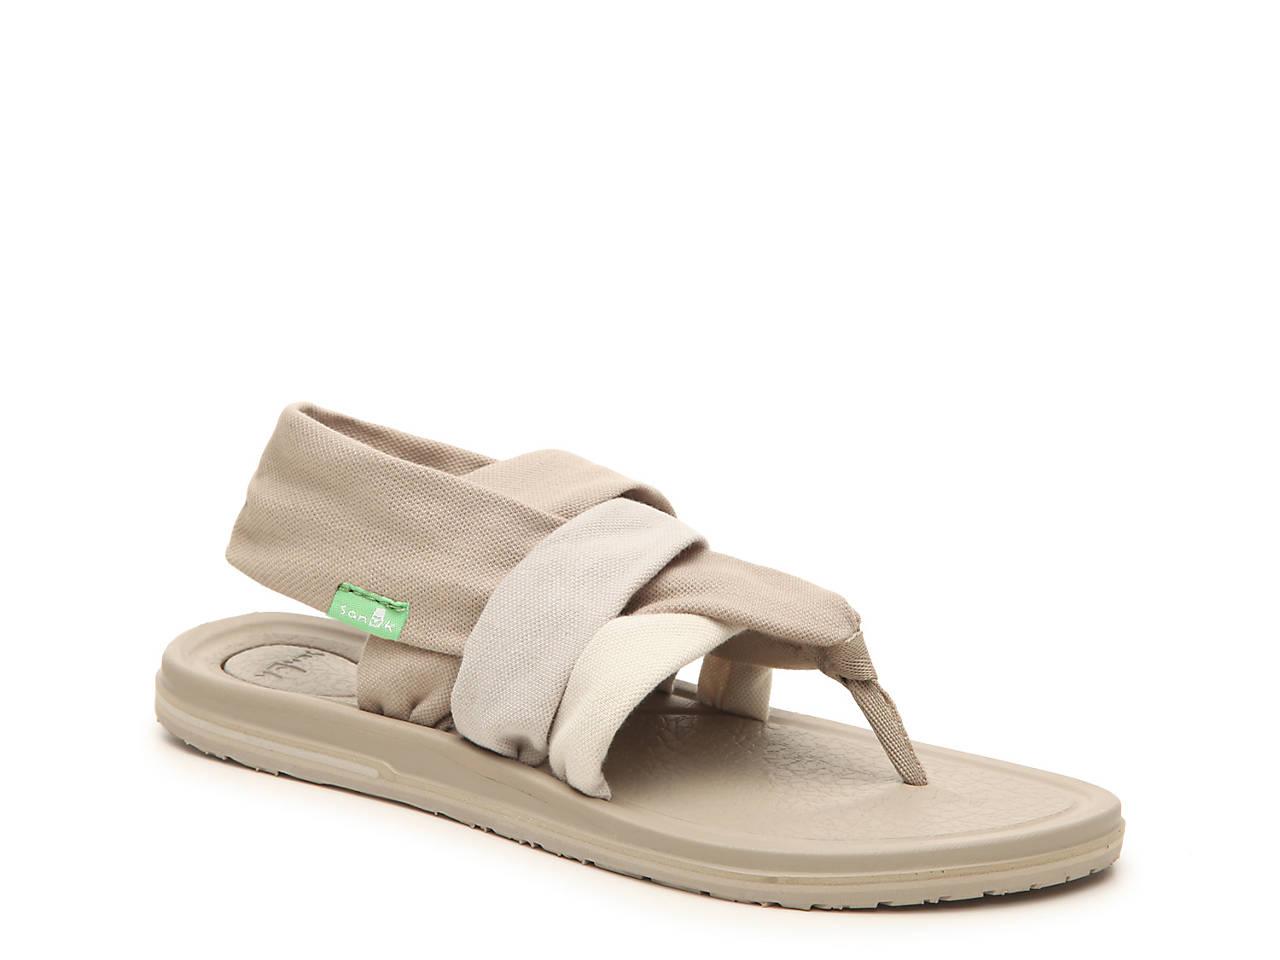 f77db7d8a2109a Sanuk Yoga Sling Sandal Women's Shoes   DSW